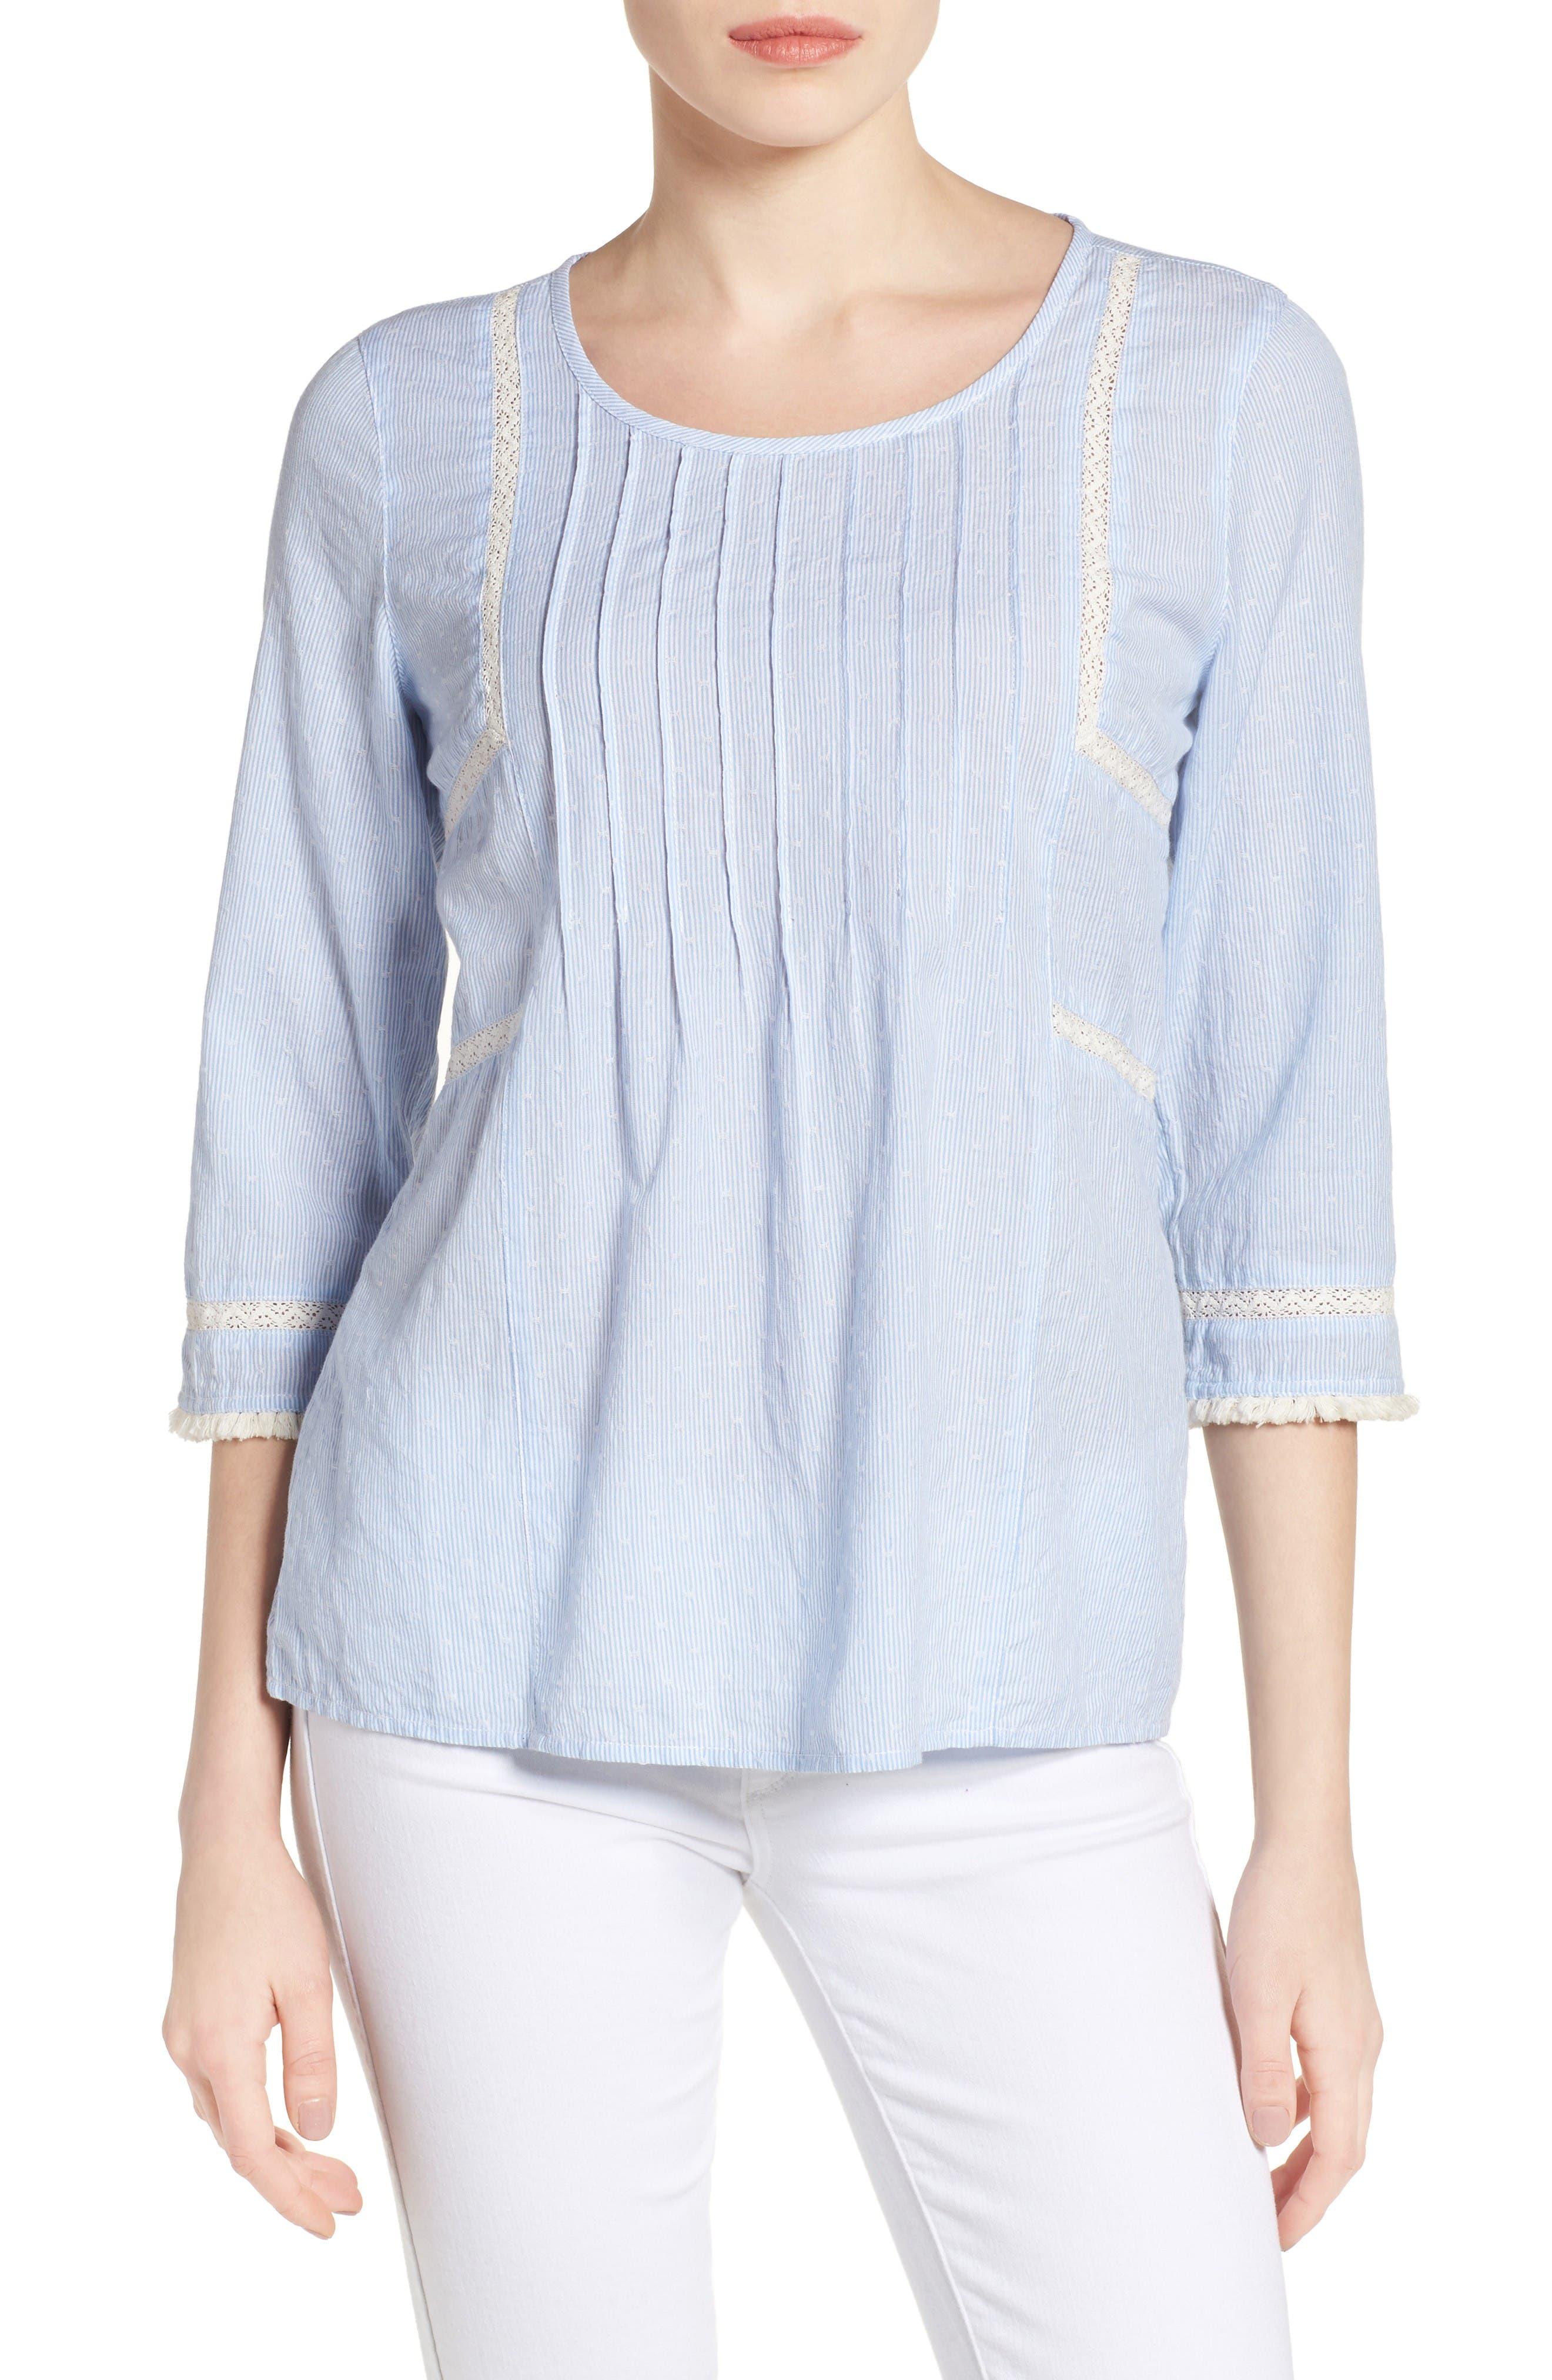 Pintuck Pleat Top,                         Main,                         color, Blue- White Stripe